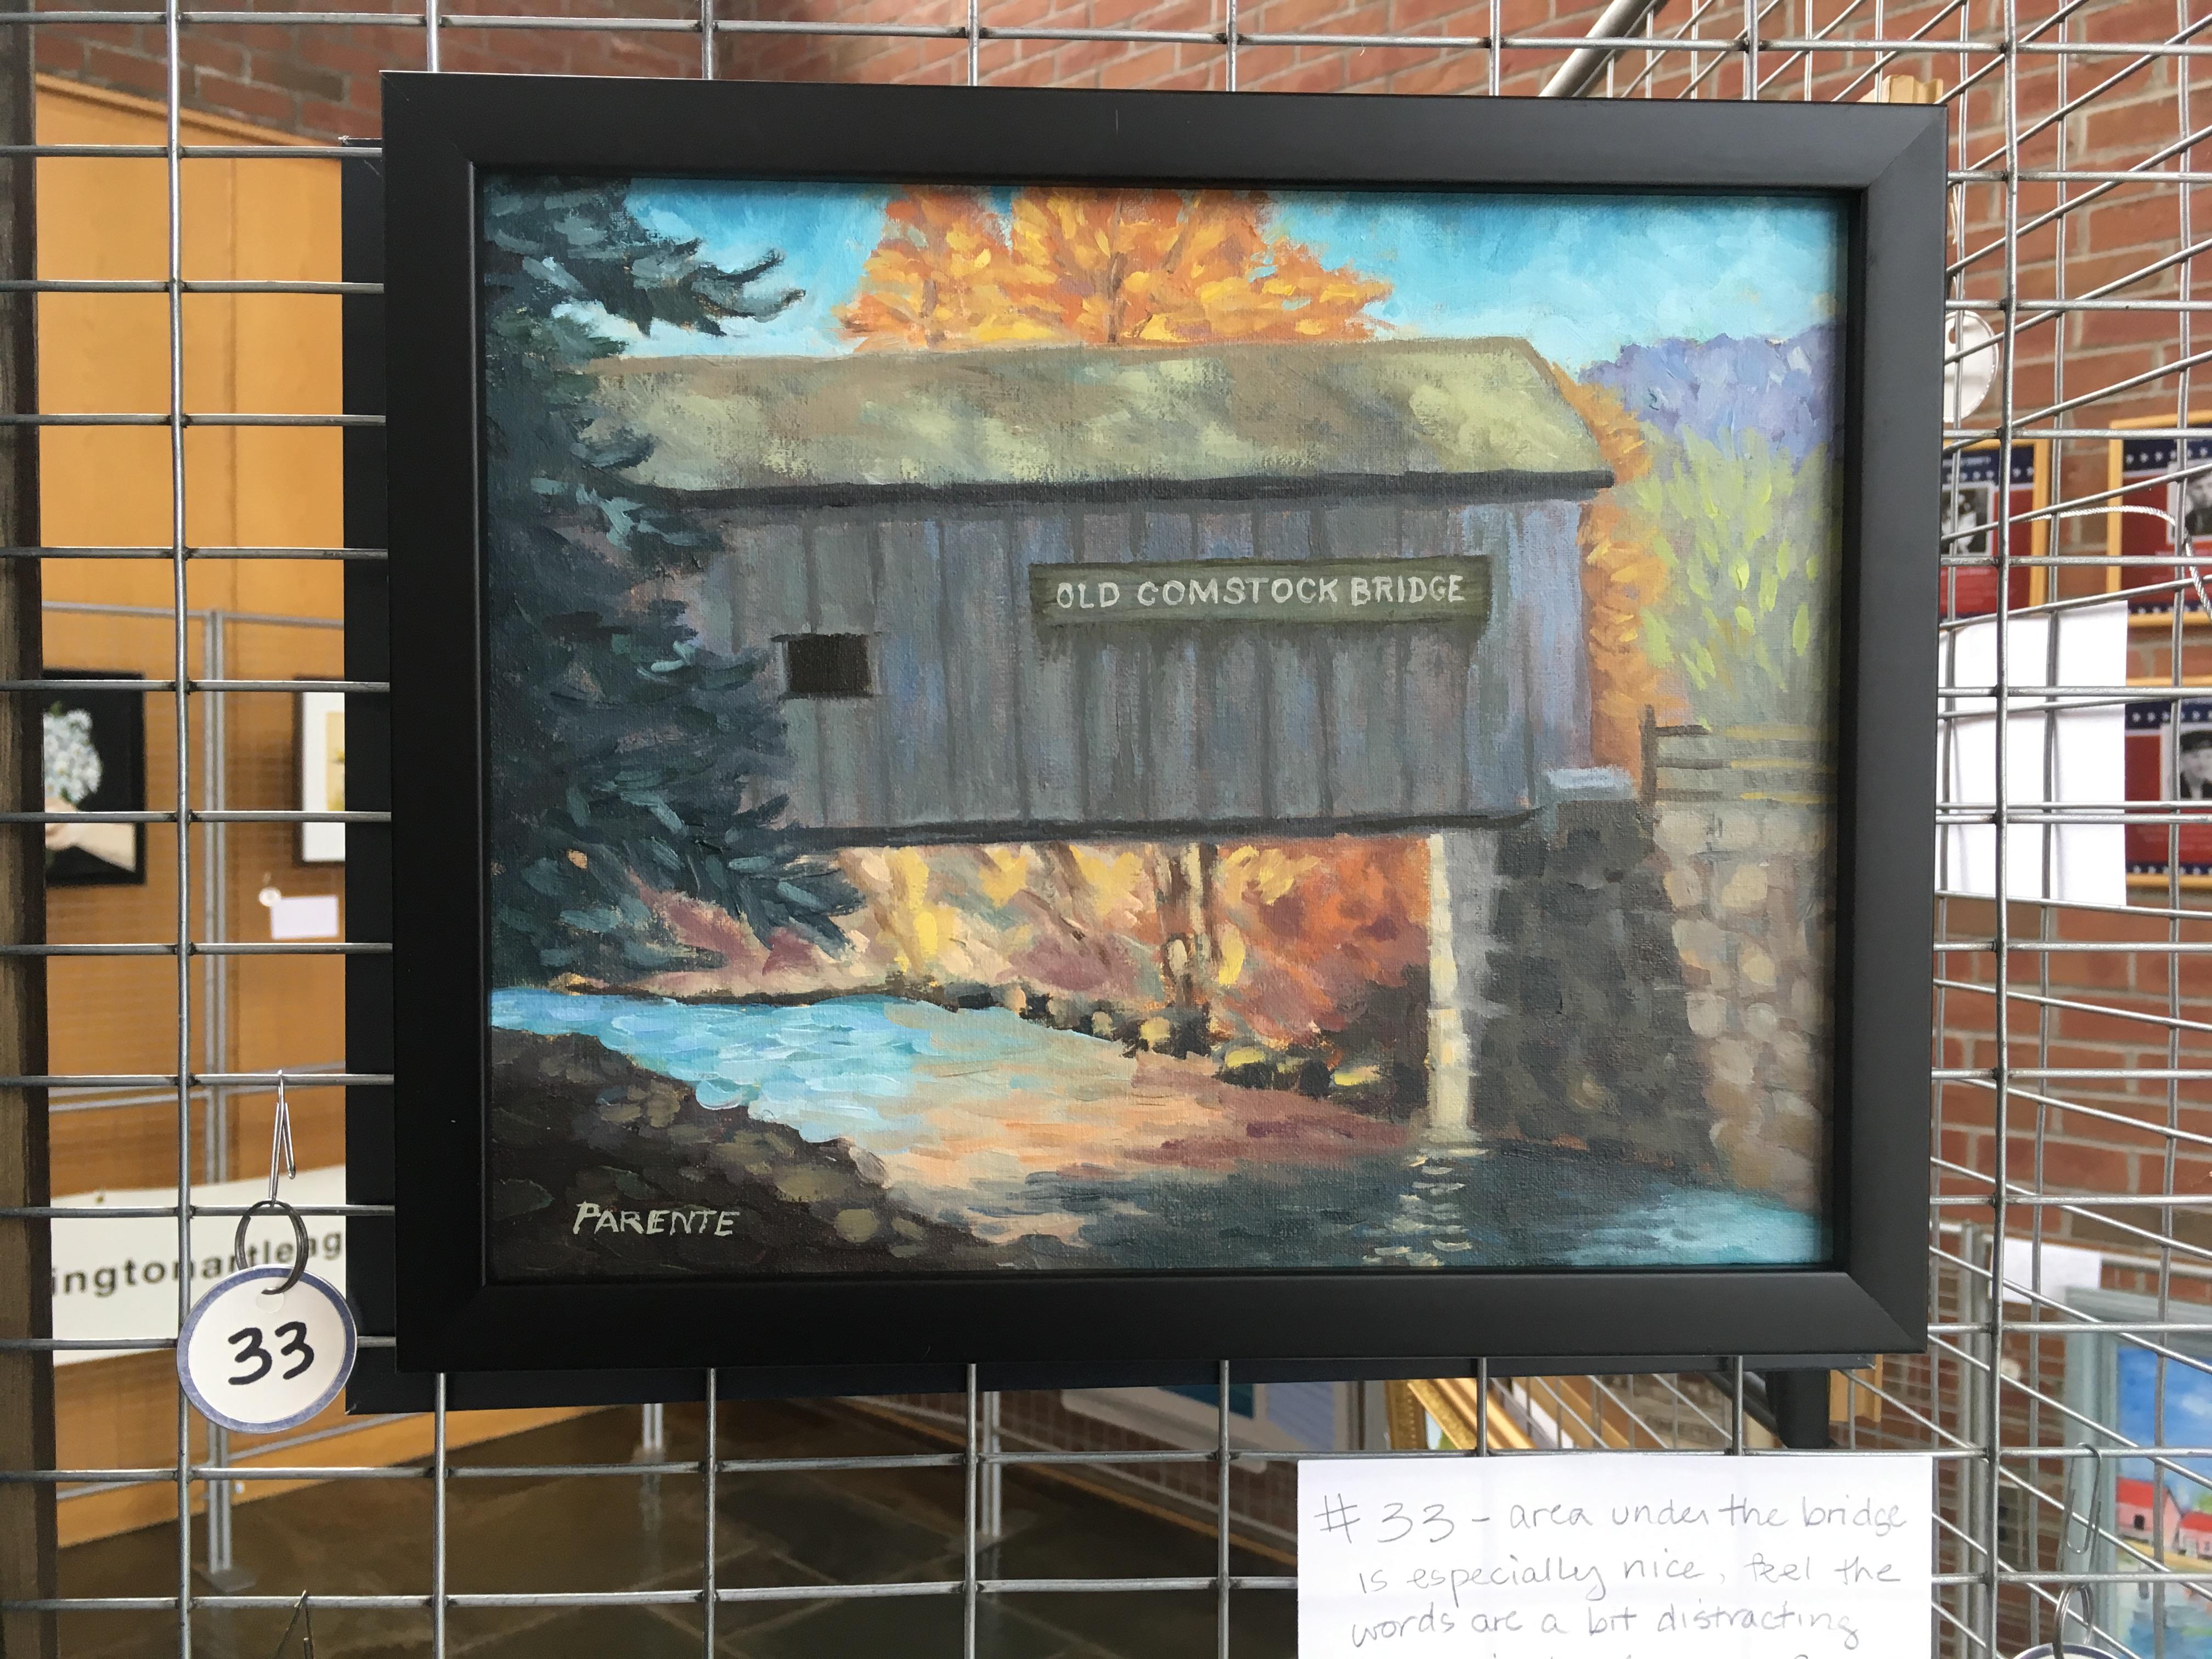 Old Comstock Bridge - Pat Parente